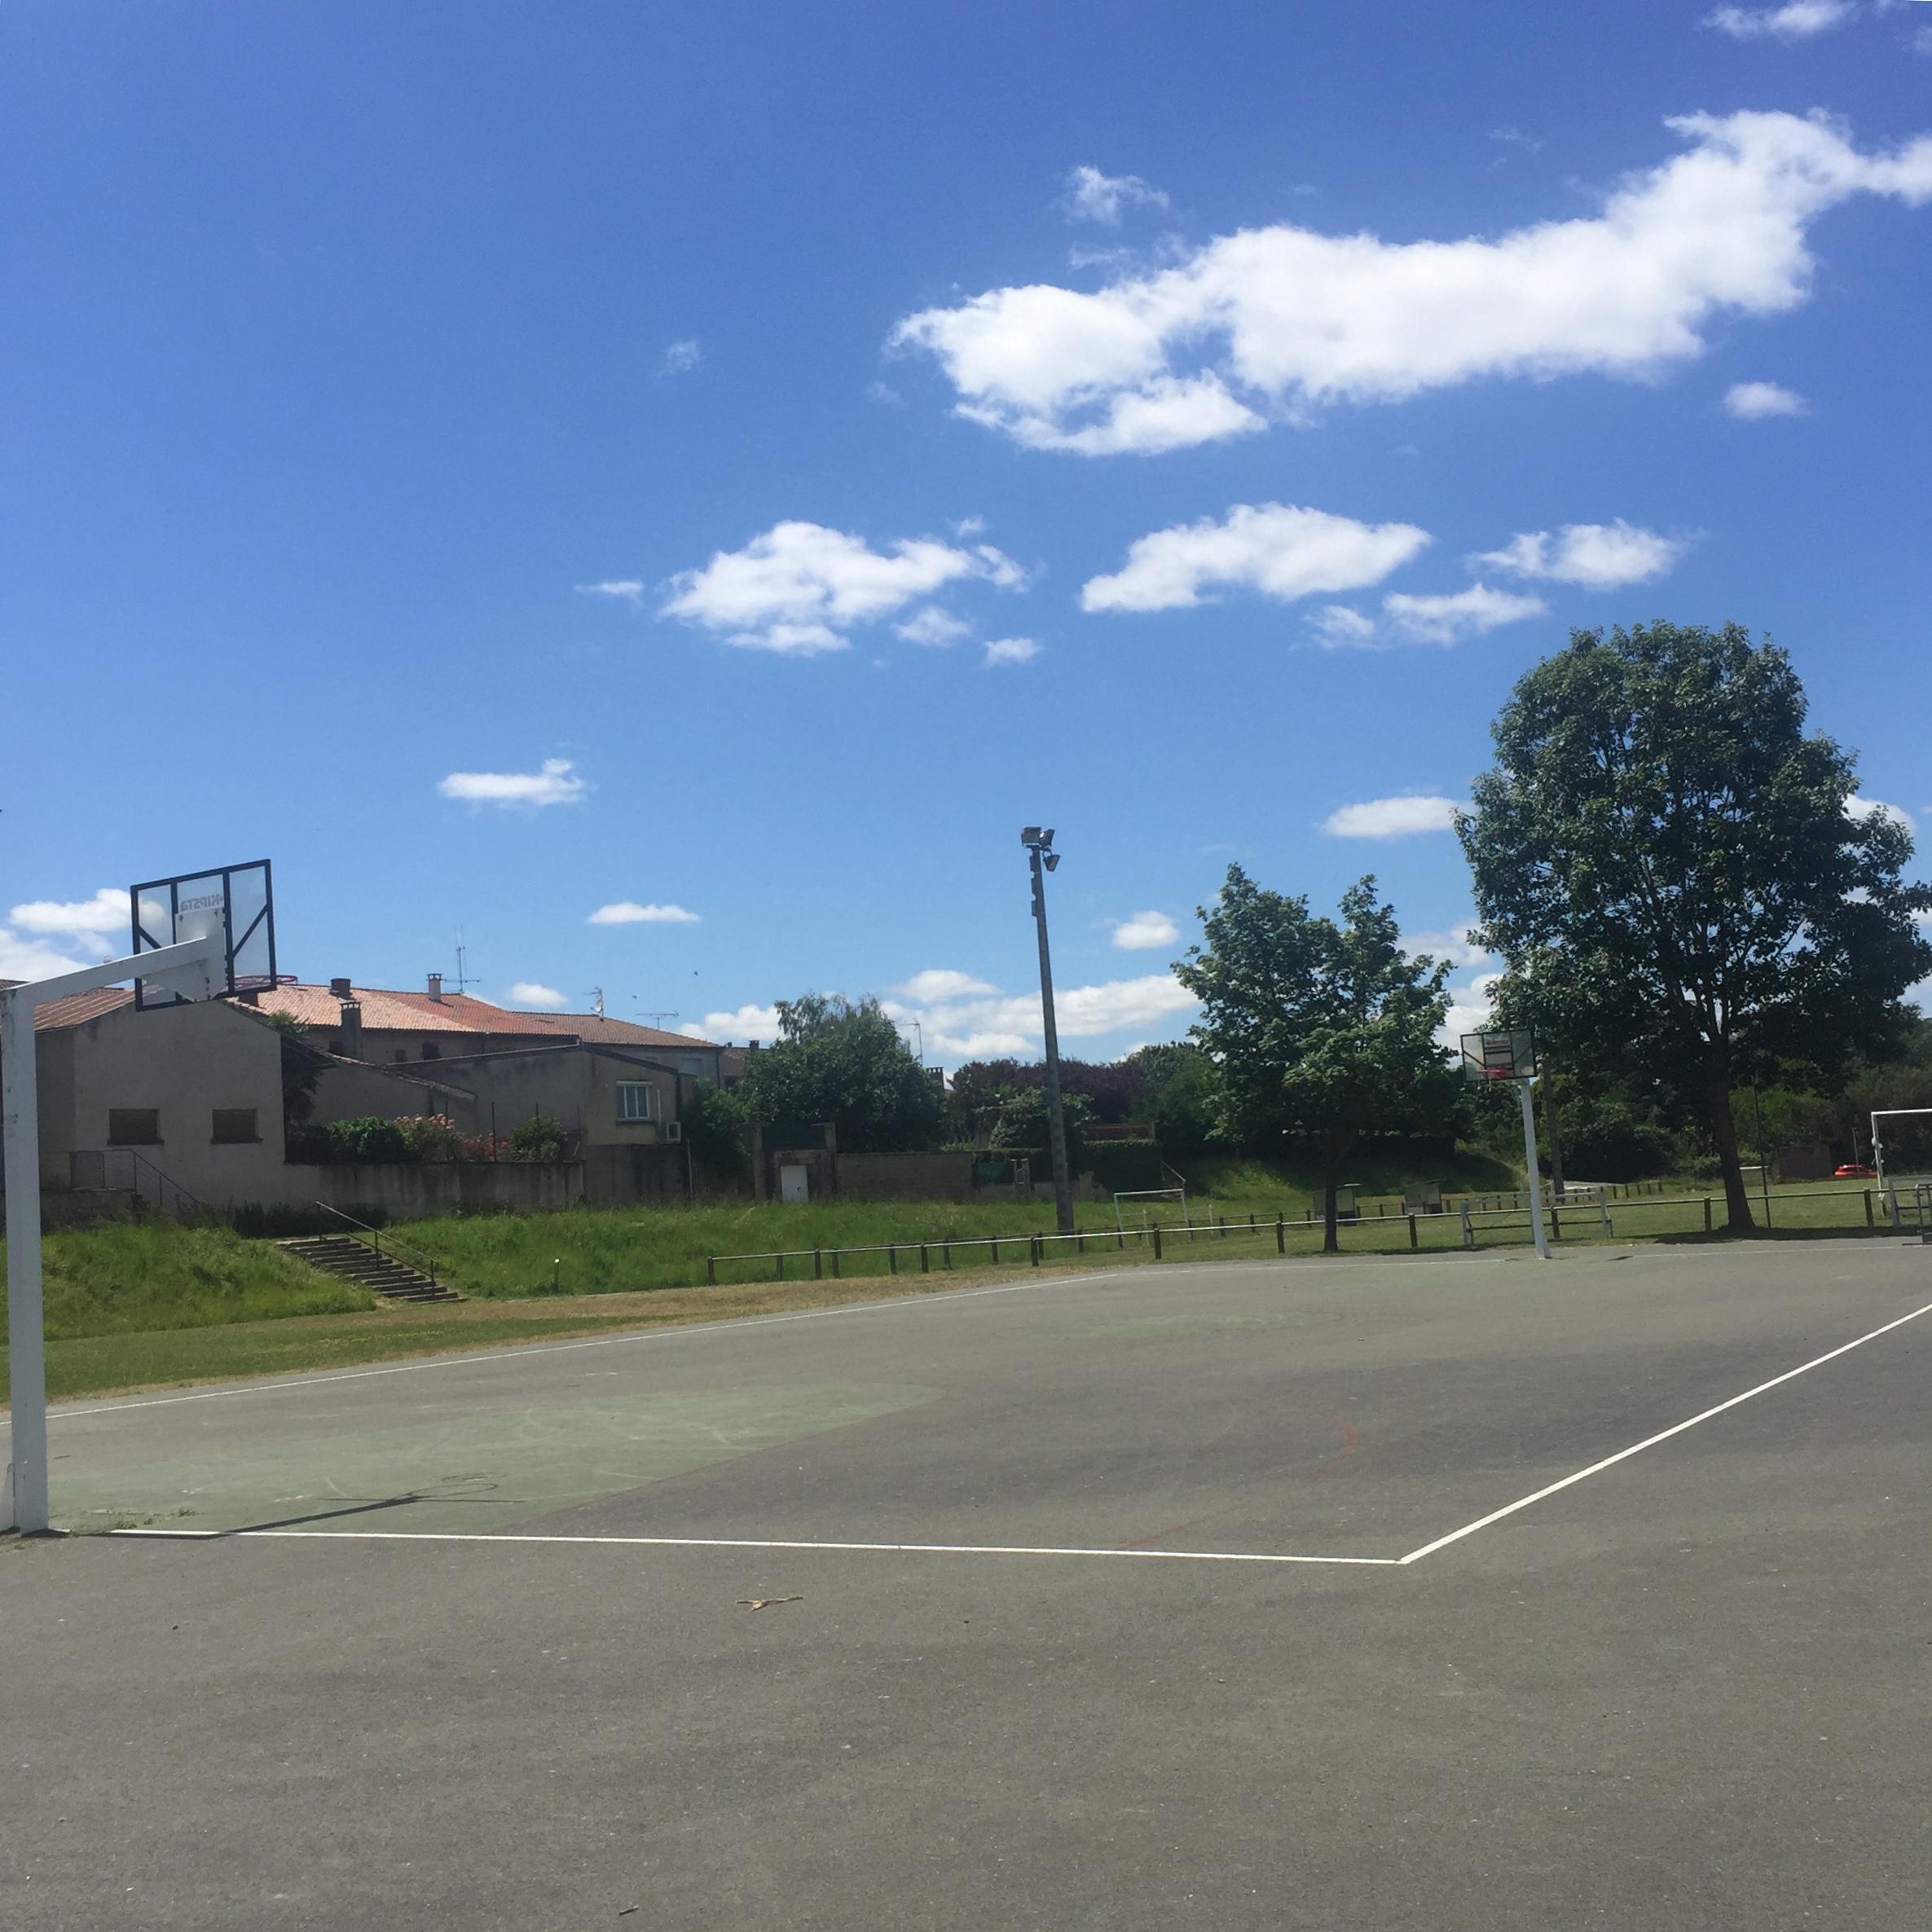 terrain basket _2_.jpg